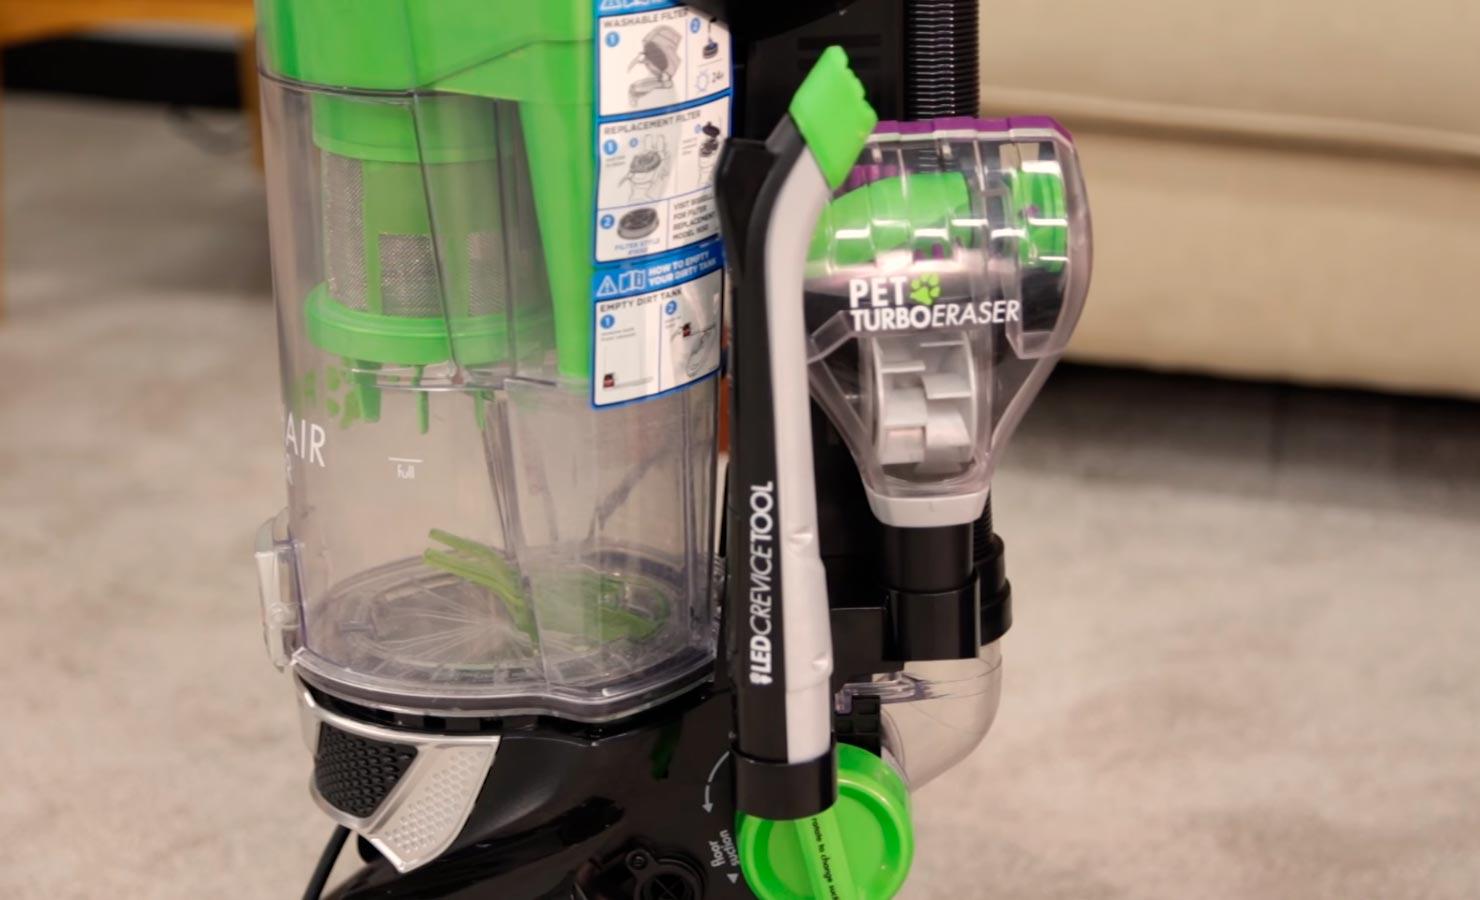 Bissell 1650A Pet Hair Eraser Vacuum tools storage